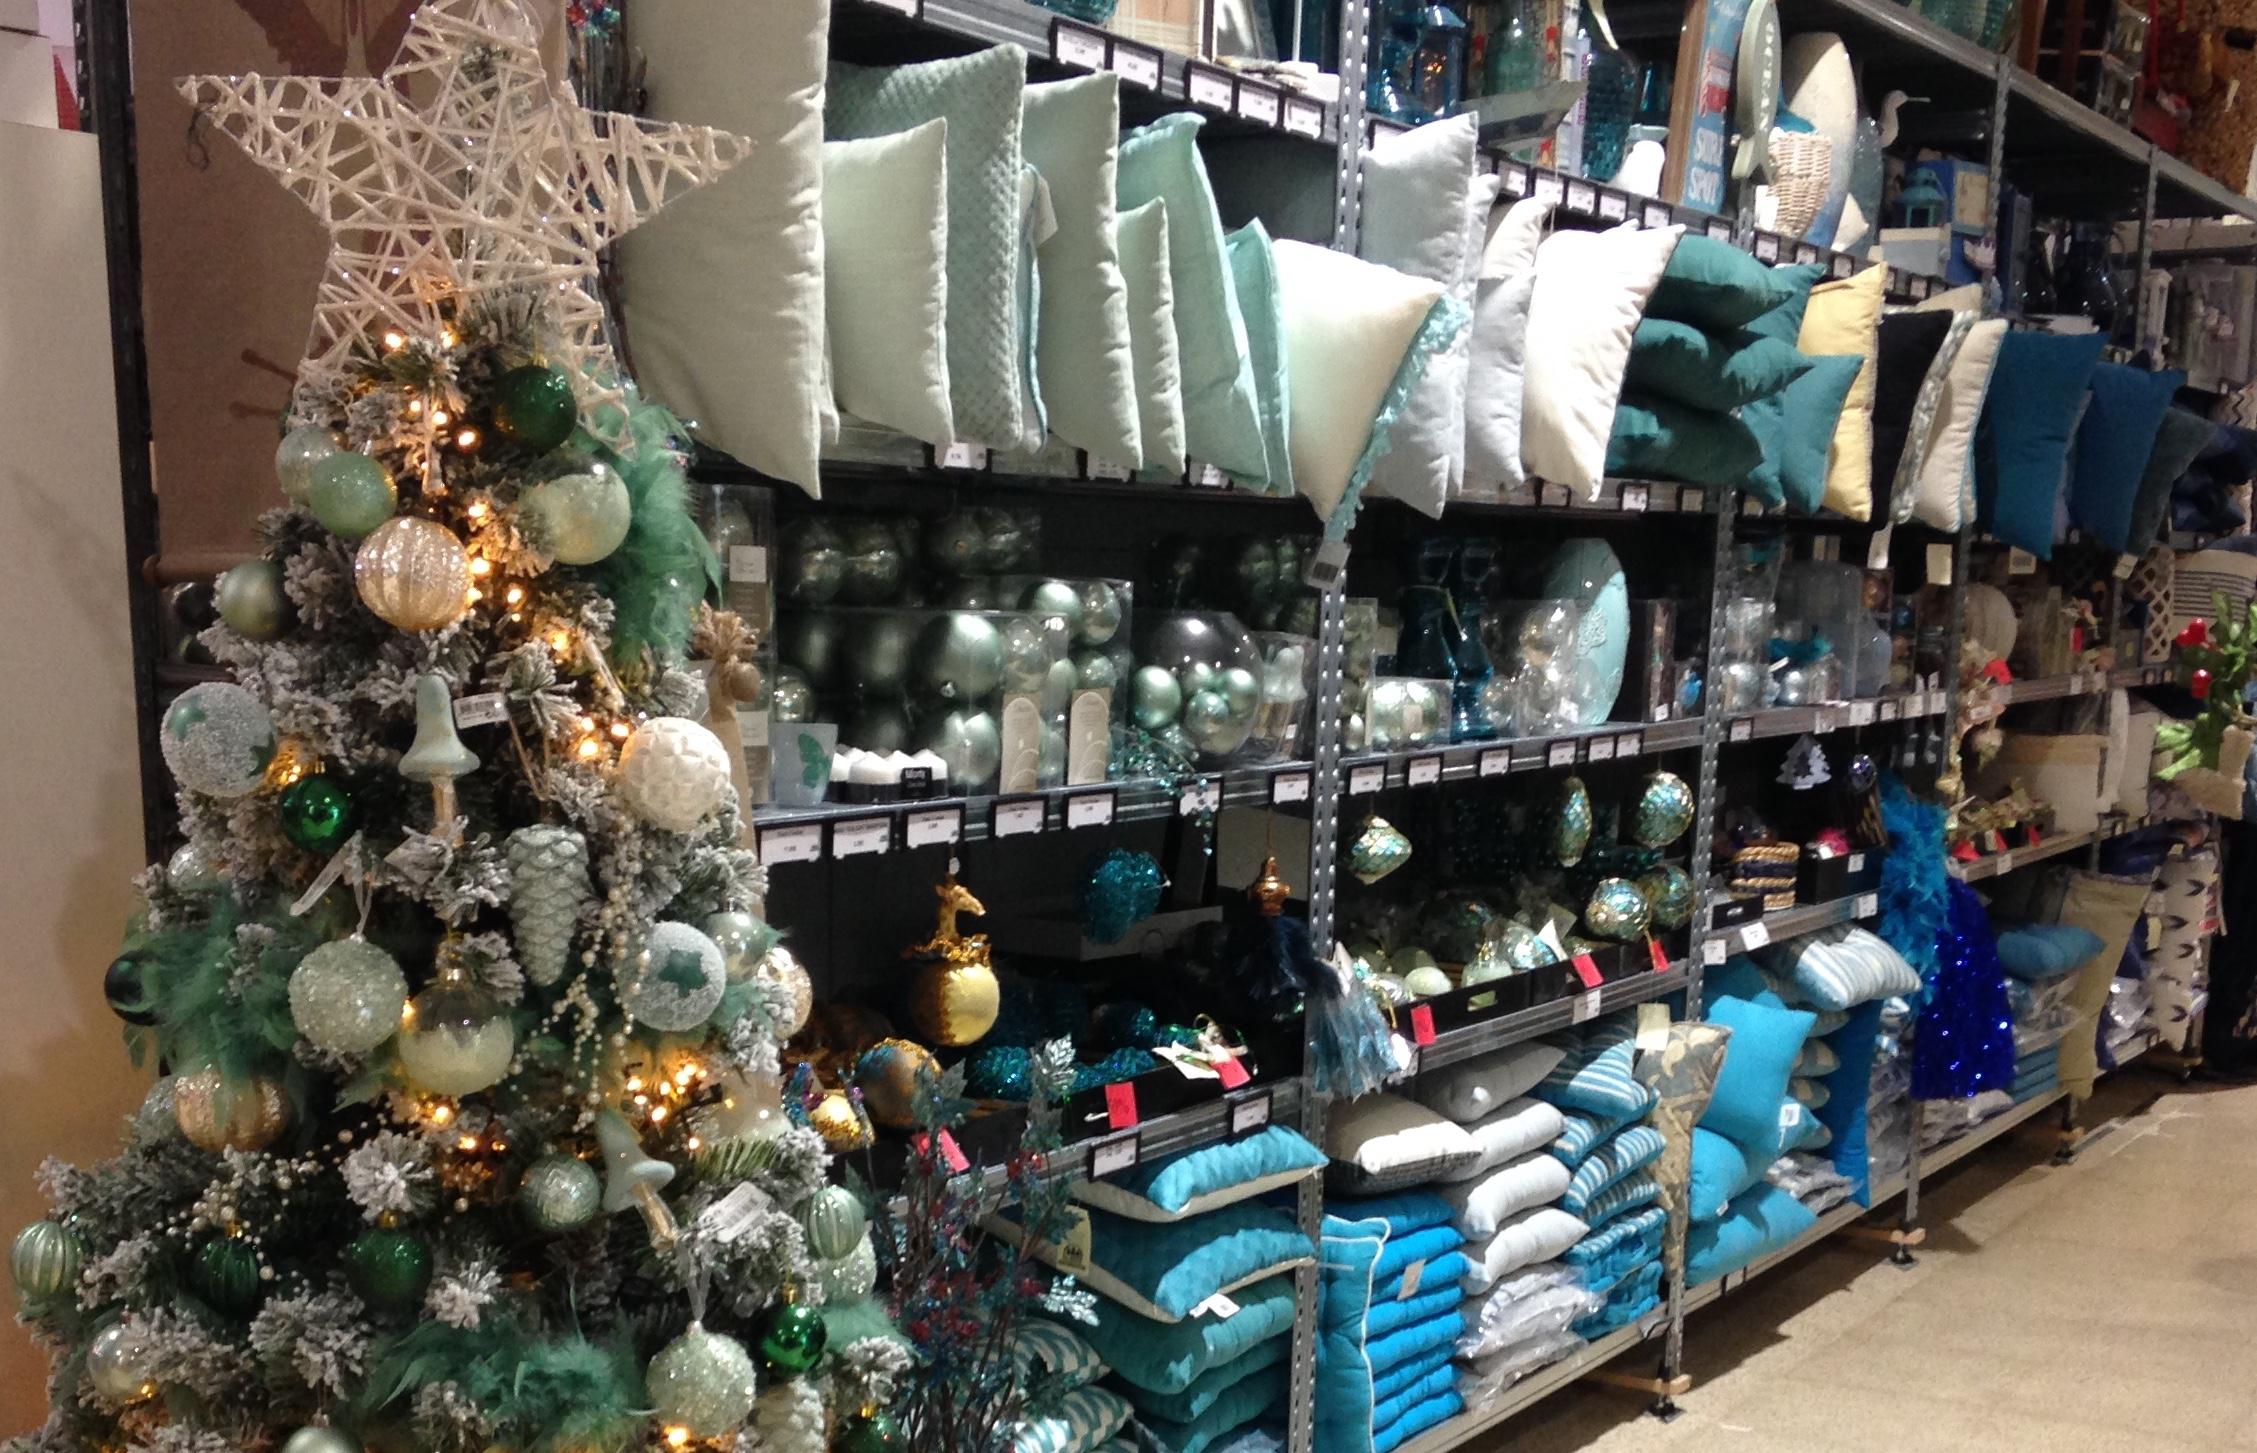 Navidad Bonninsanso2 - Trends in Christmas Decorations 2018